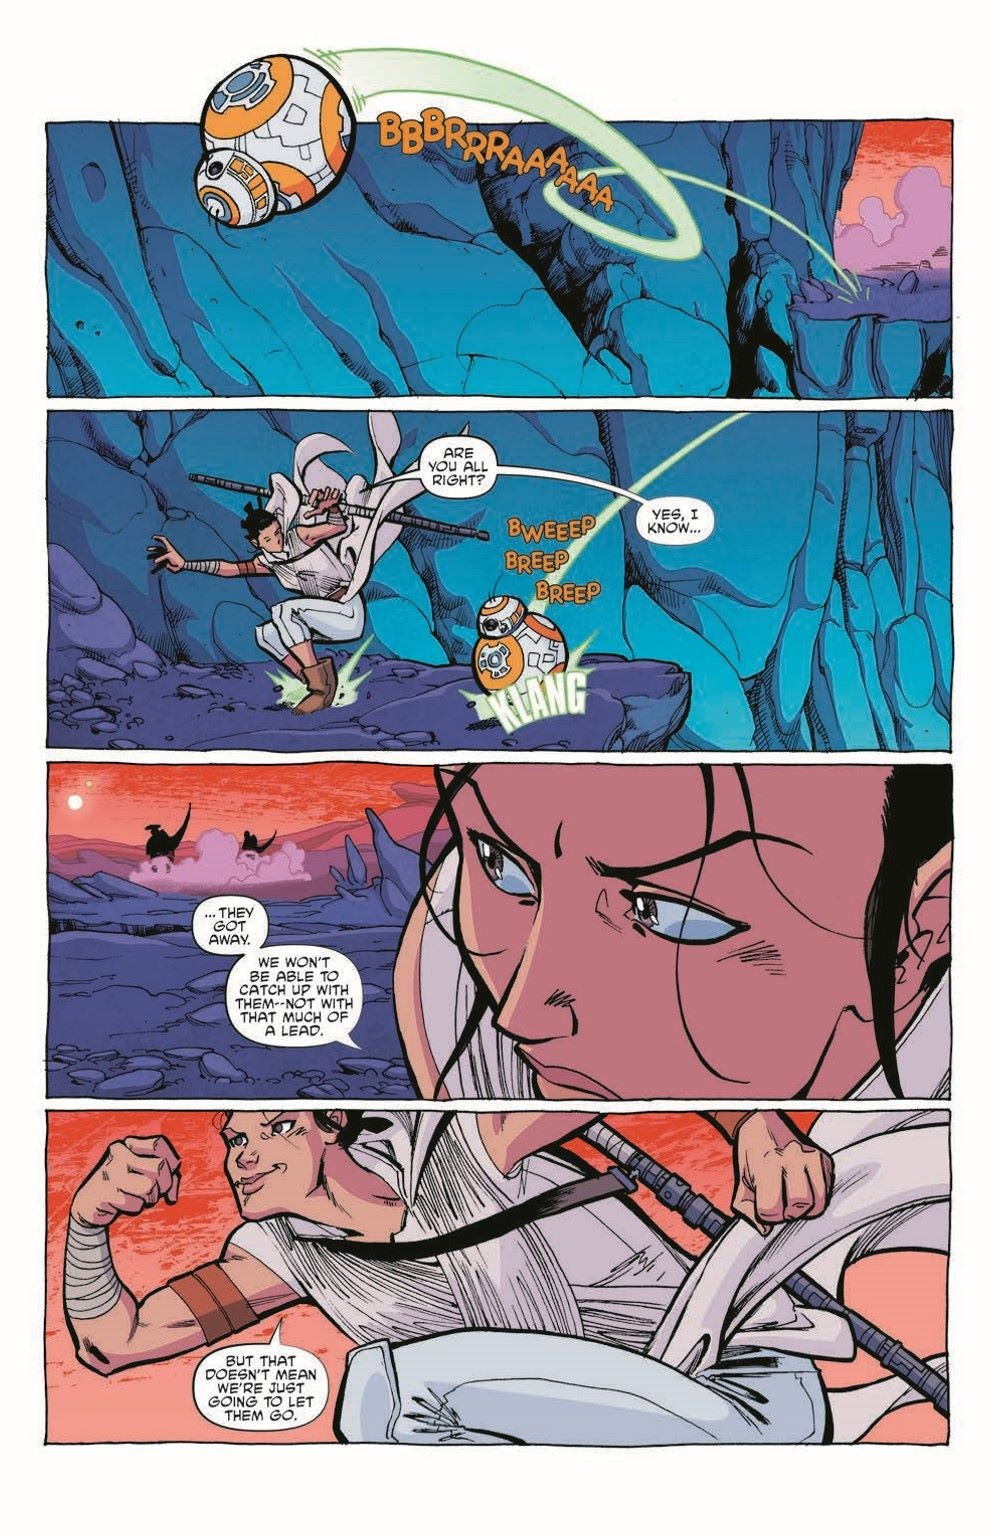 StarWarsAdv02-pr-6 ComicList Previews: STAR WARS ADVENTURES VOLUME 2 #2